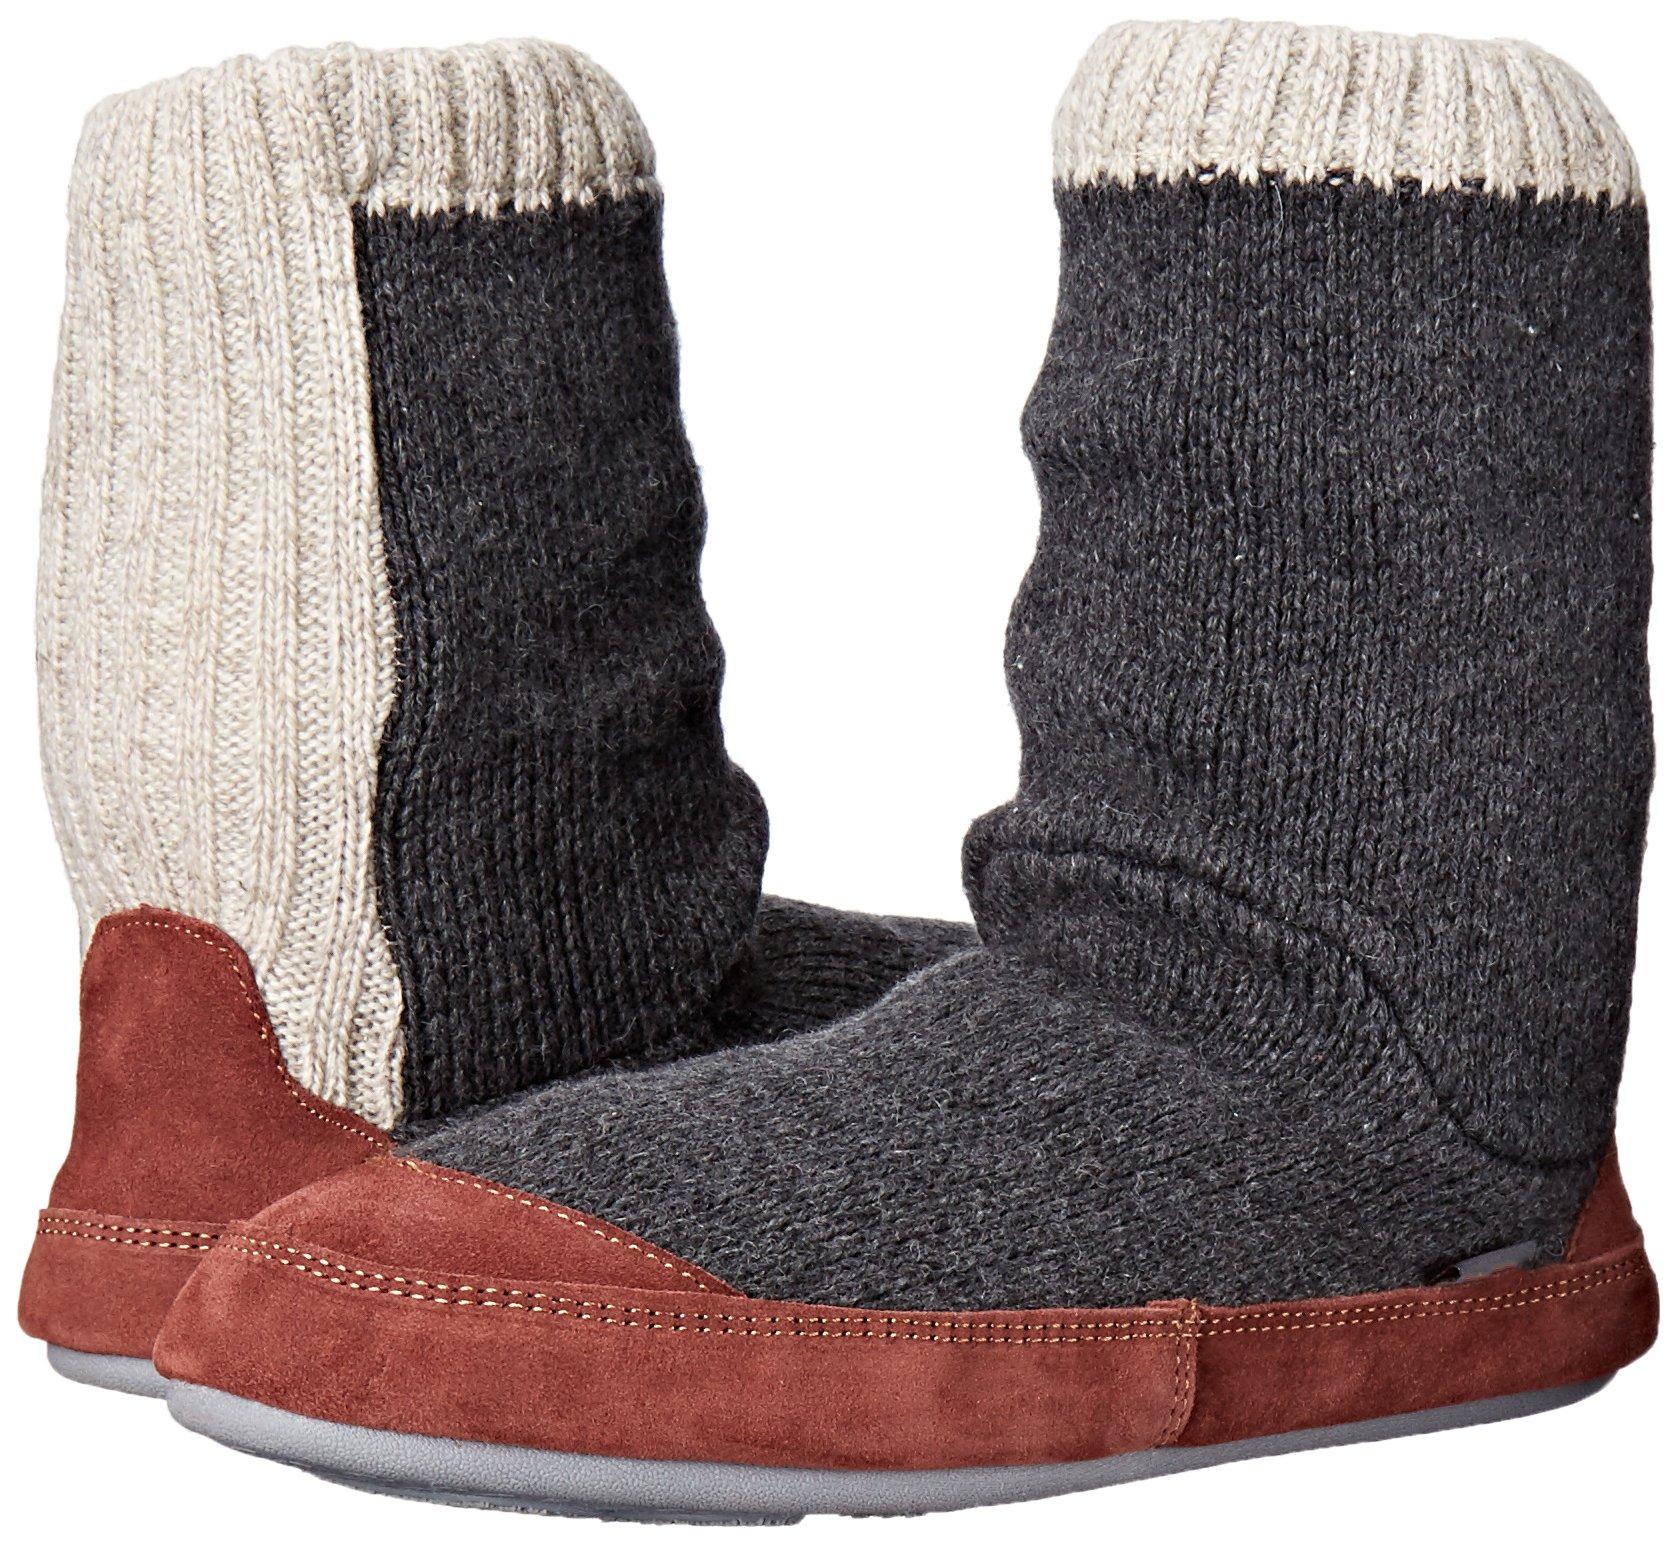 Acorn Men's Slouch Boot Slipper, Charcoal Ragg Wool, Medium/9-10 B US by Acorn (Image #6)